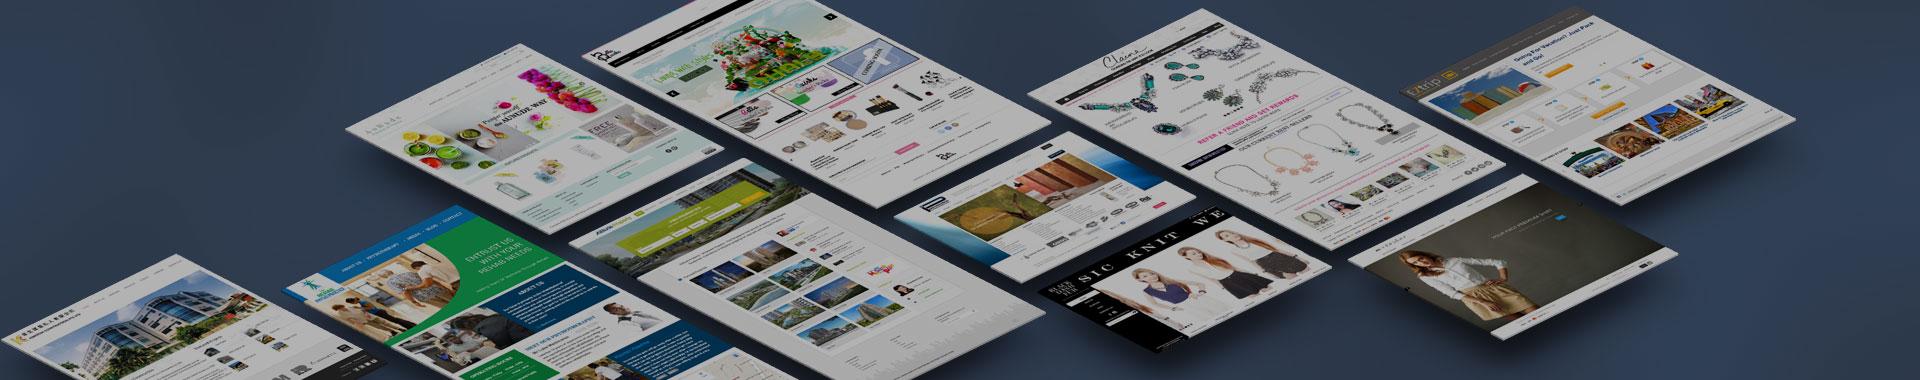 Website Design Singapore - Marlebel Box